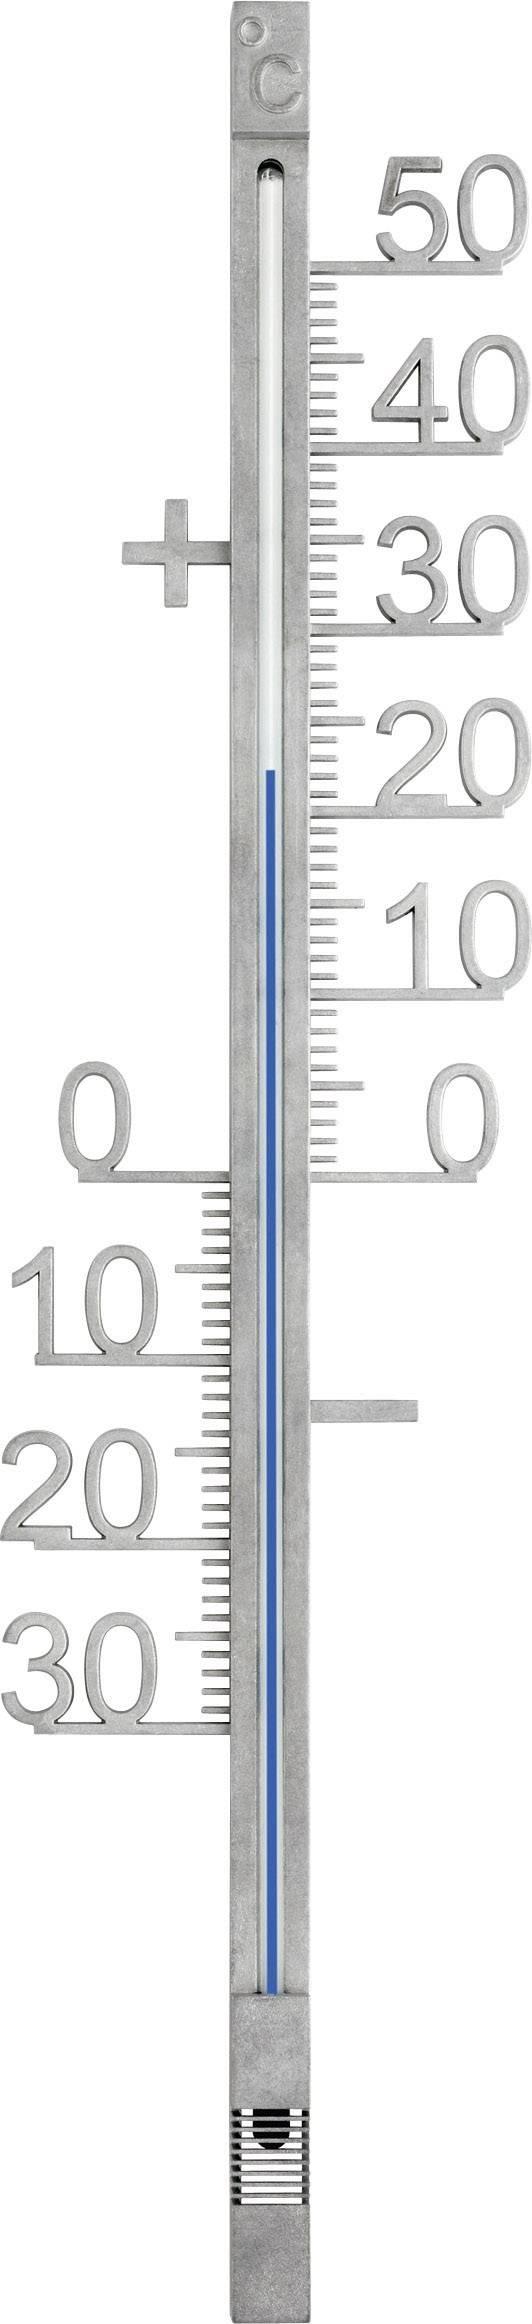 Nye TFA 12.5011 Væg Termometer Sølv | Conradelektronik.dk HH-22